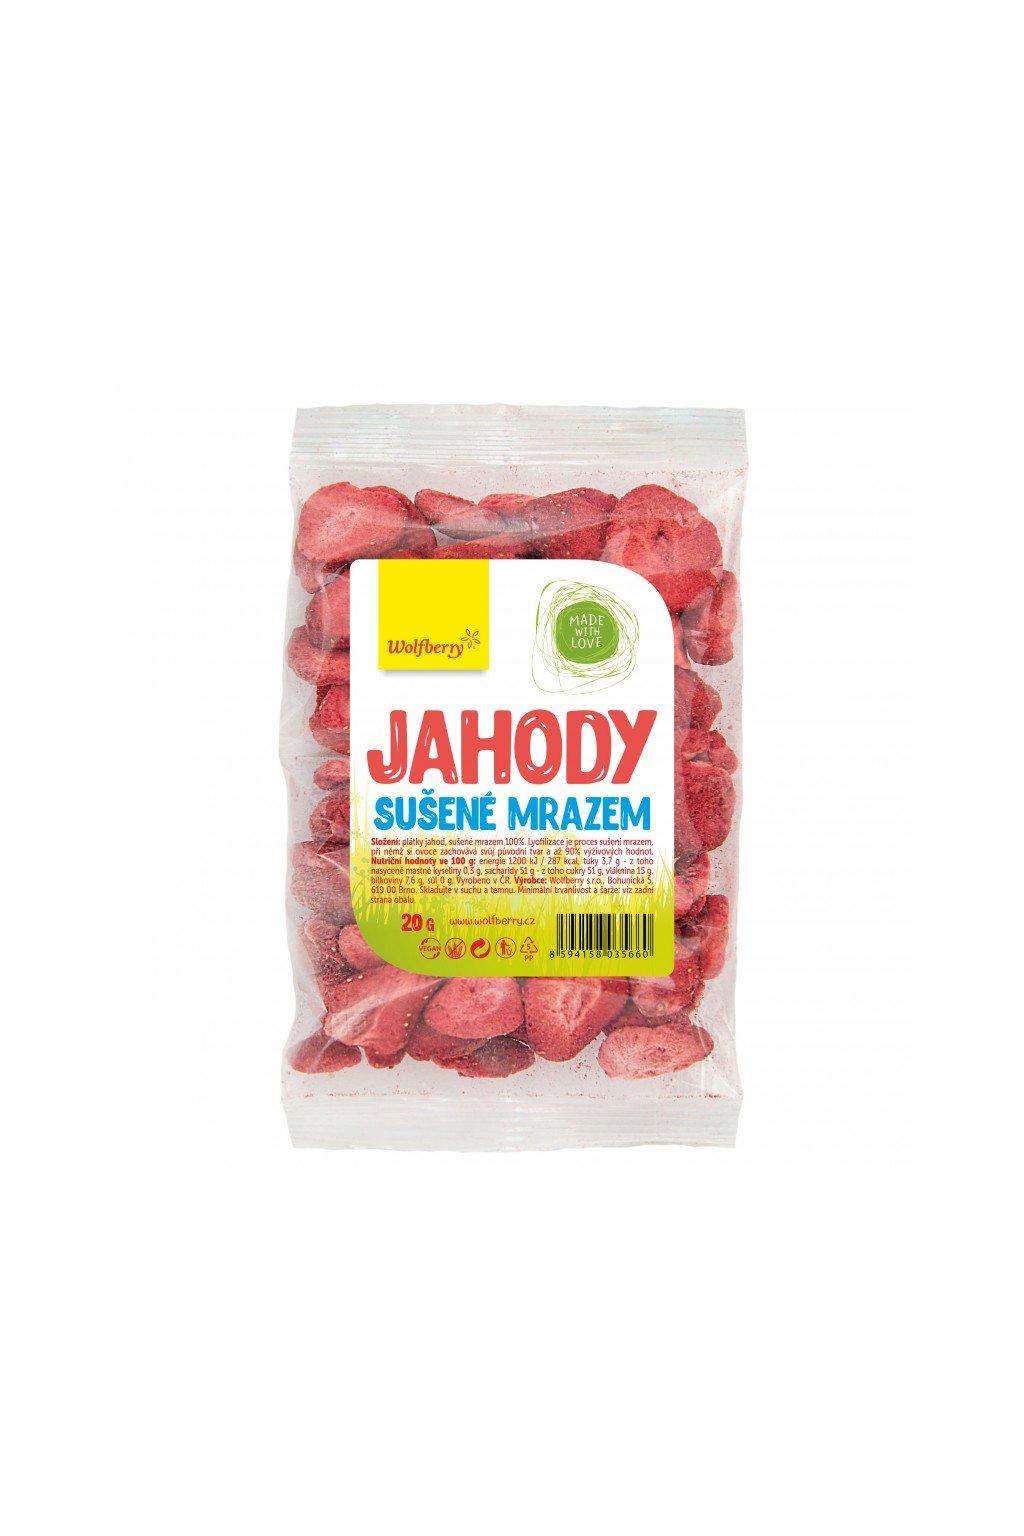 jahody 20 g wolfberry